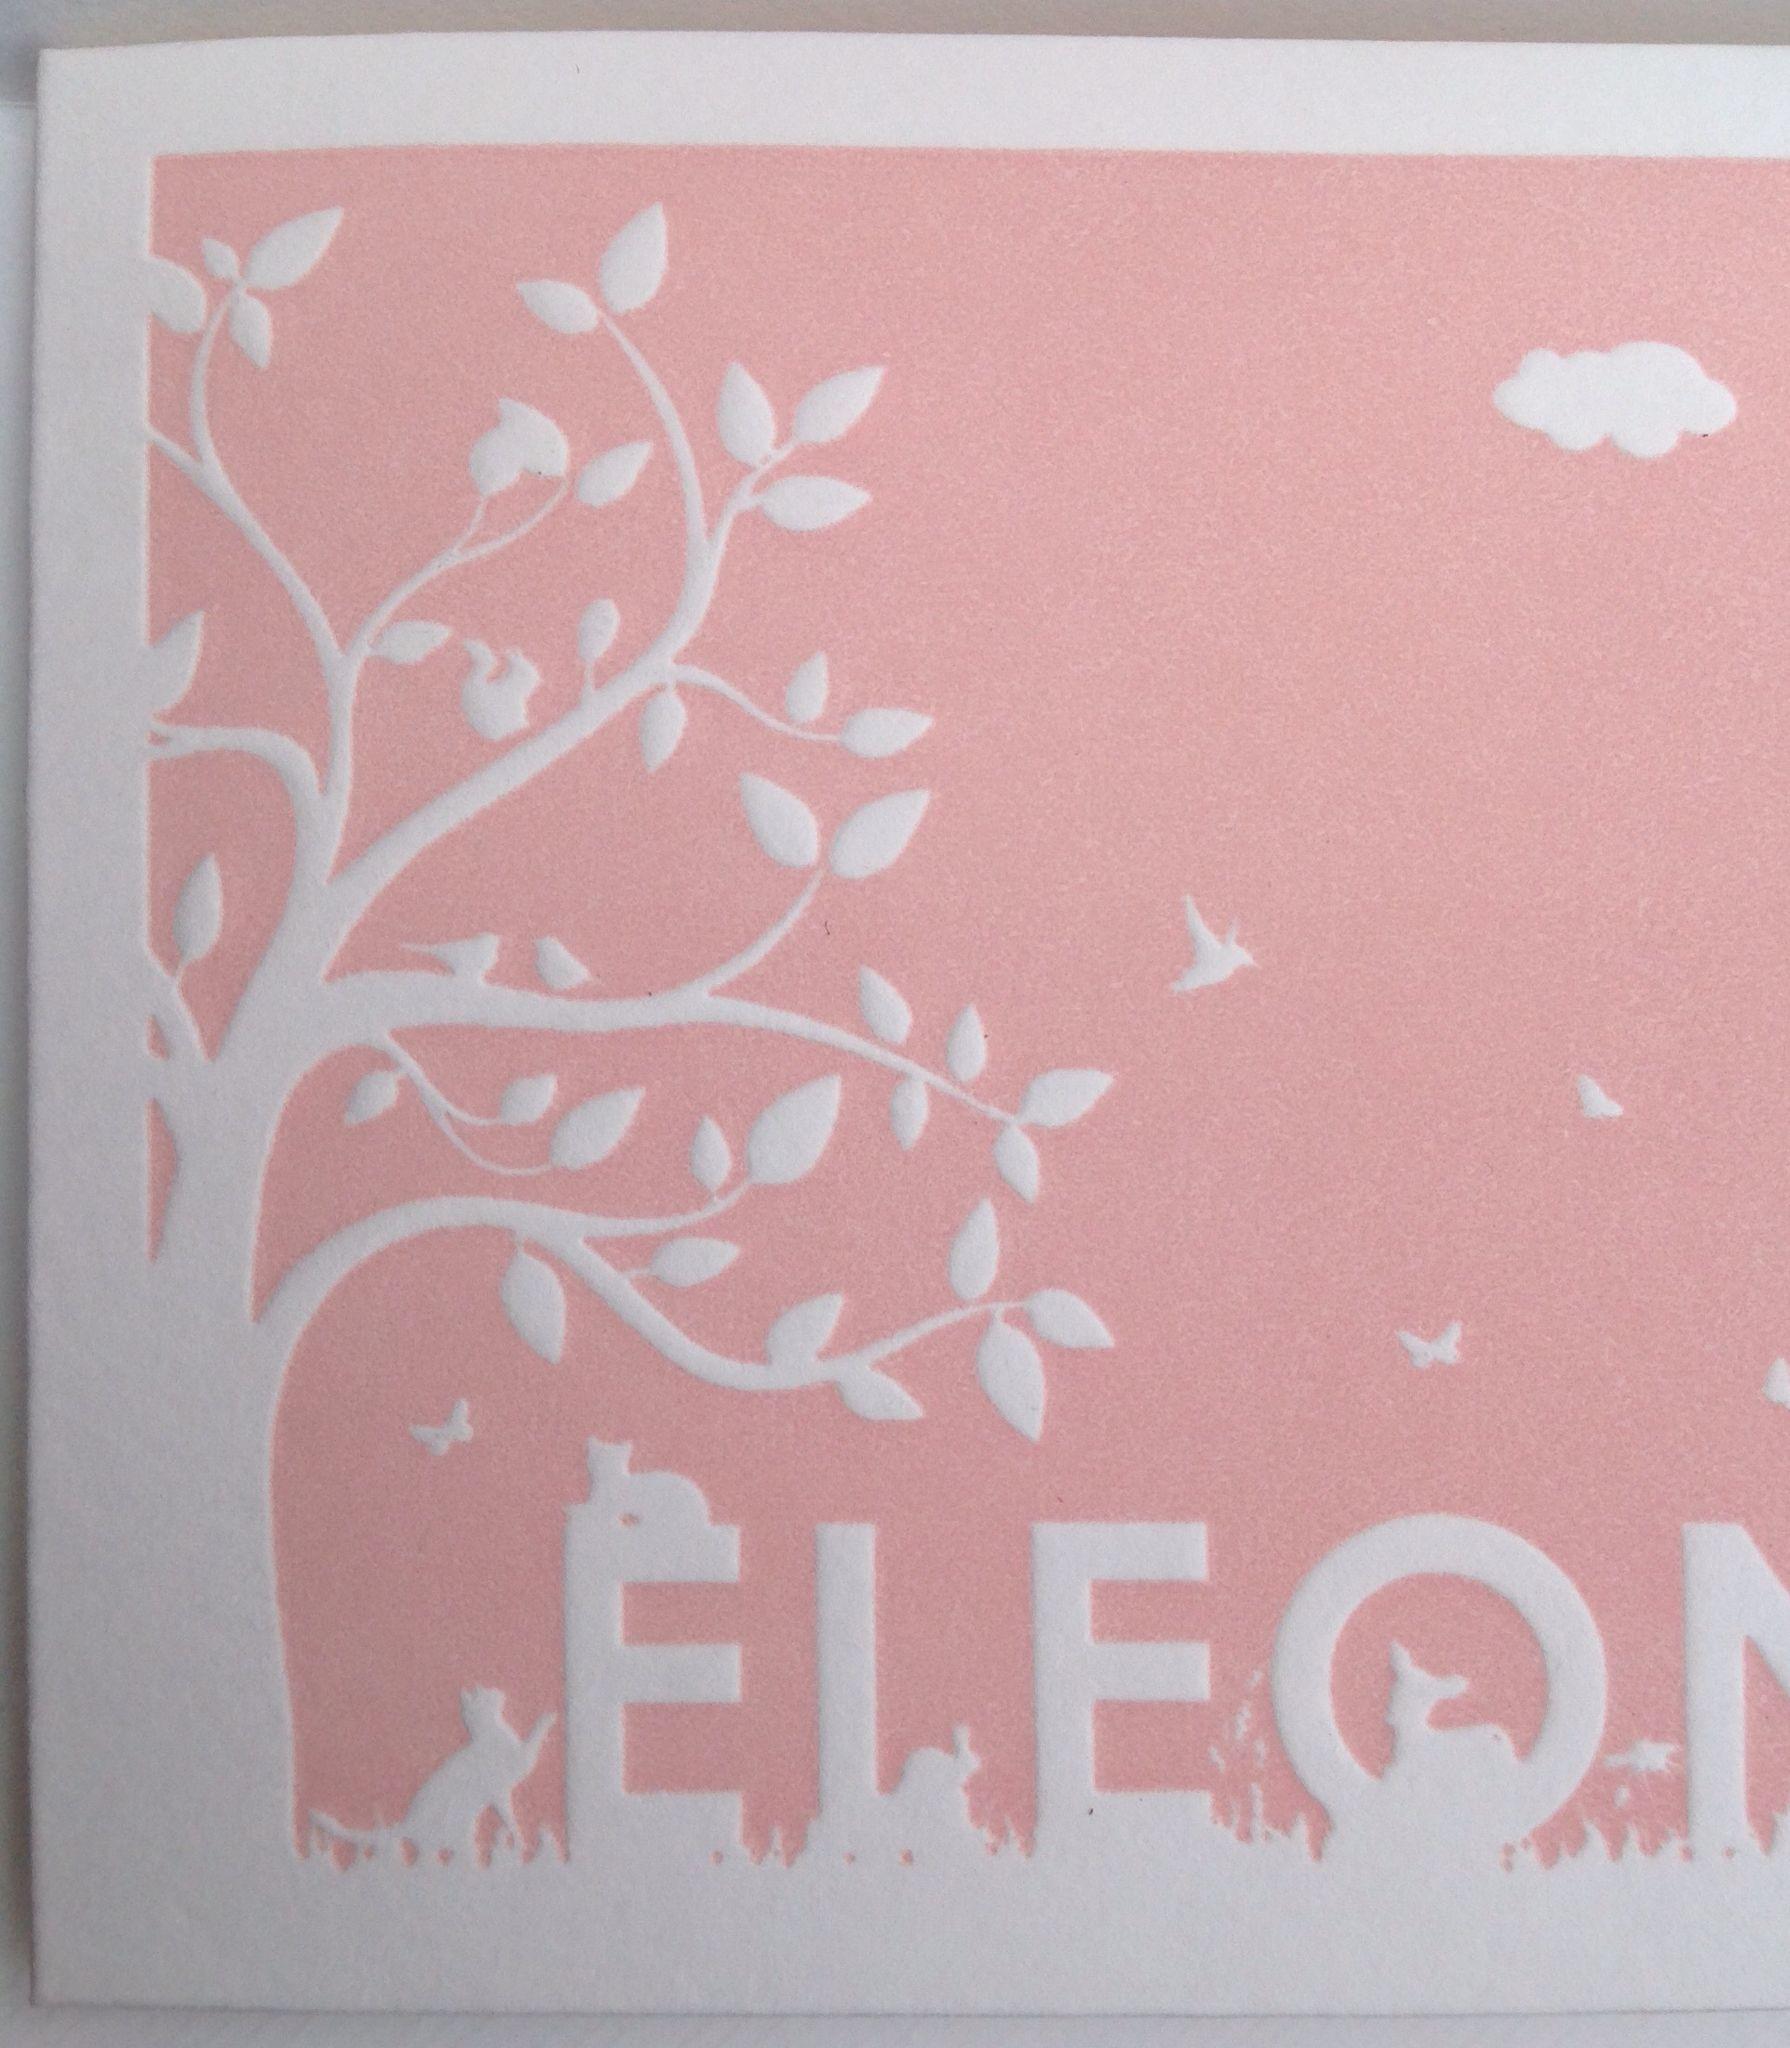 geboortekaartenonline.nl # letterpress # roze # pink # reliëf druk